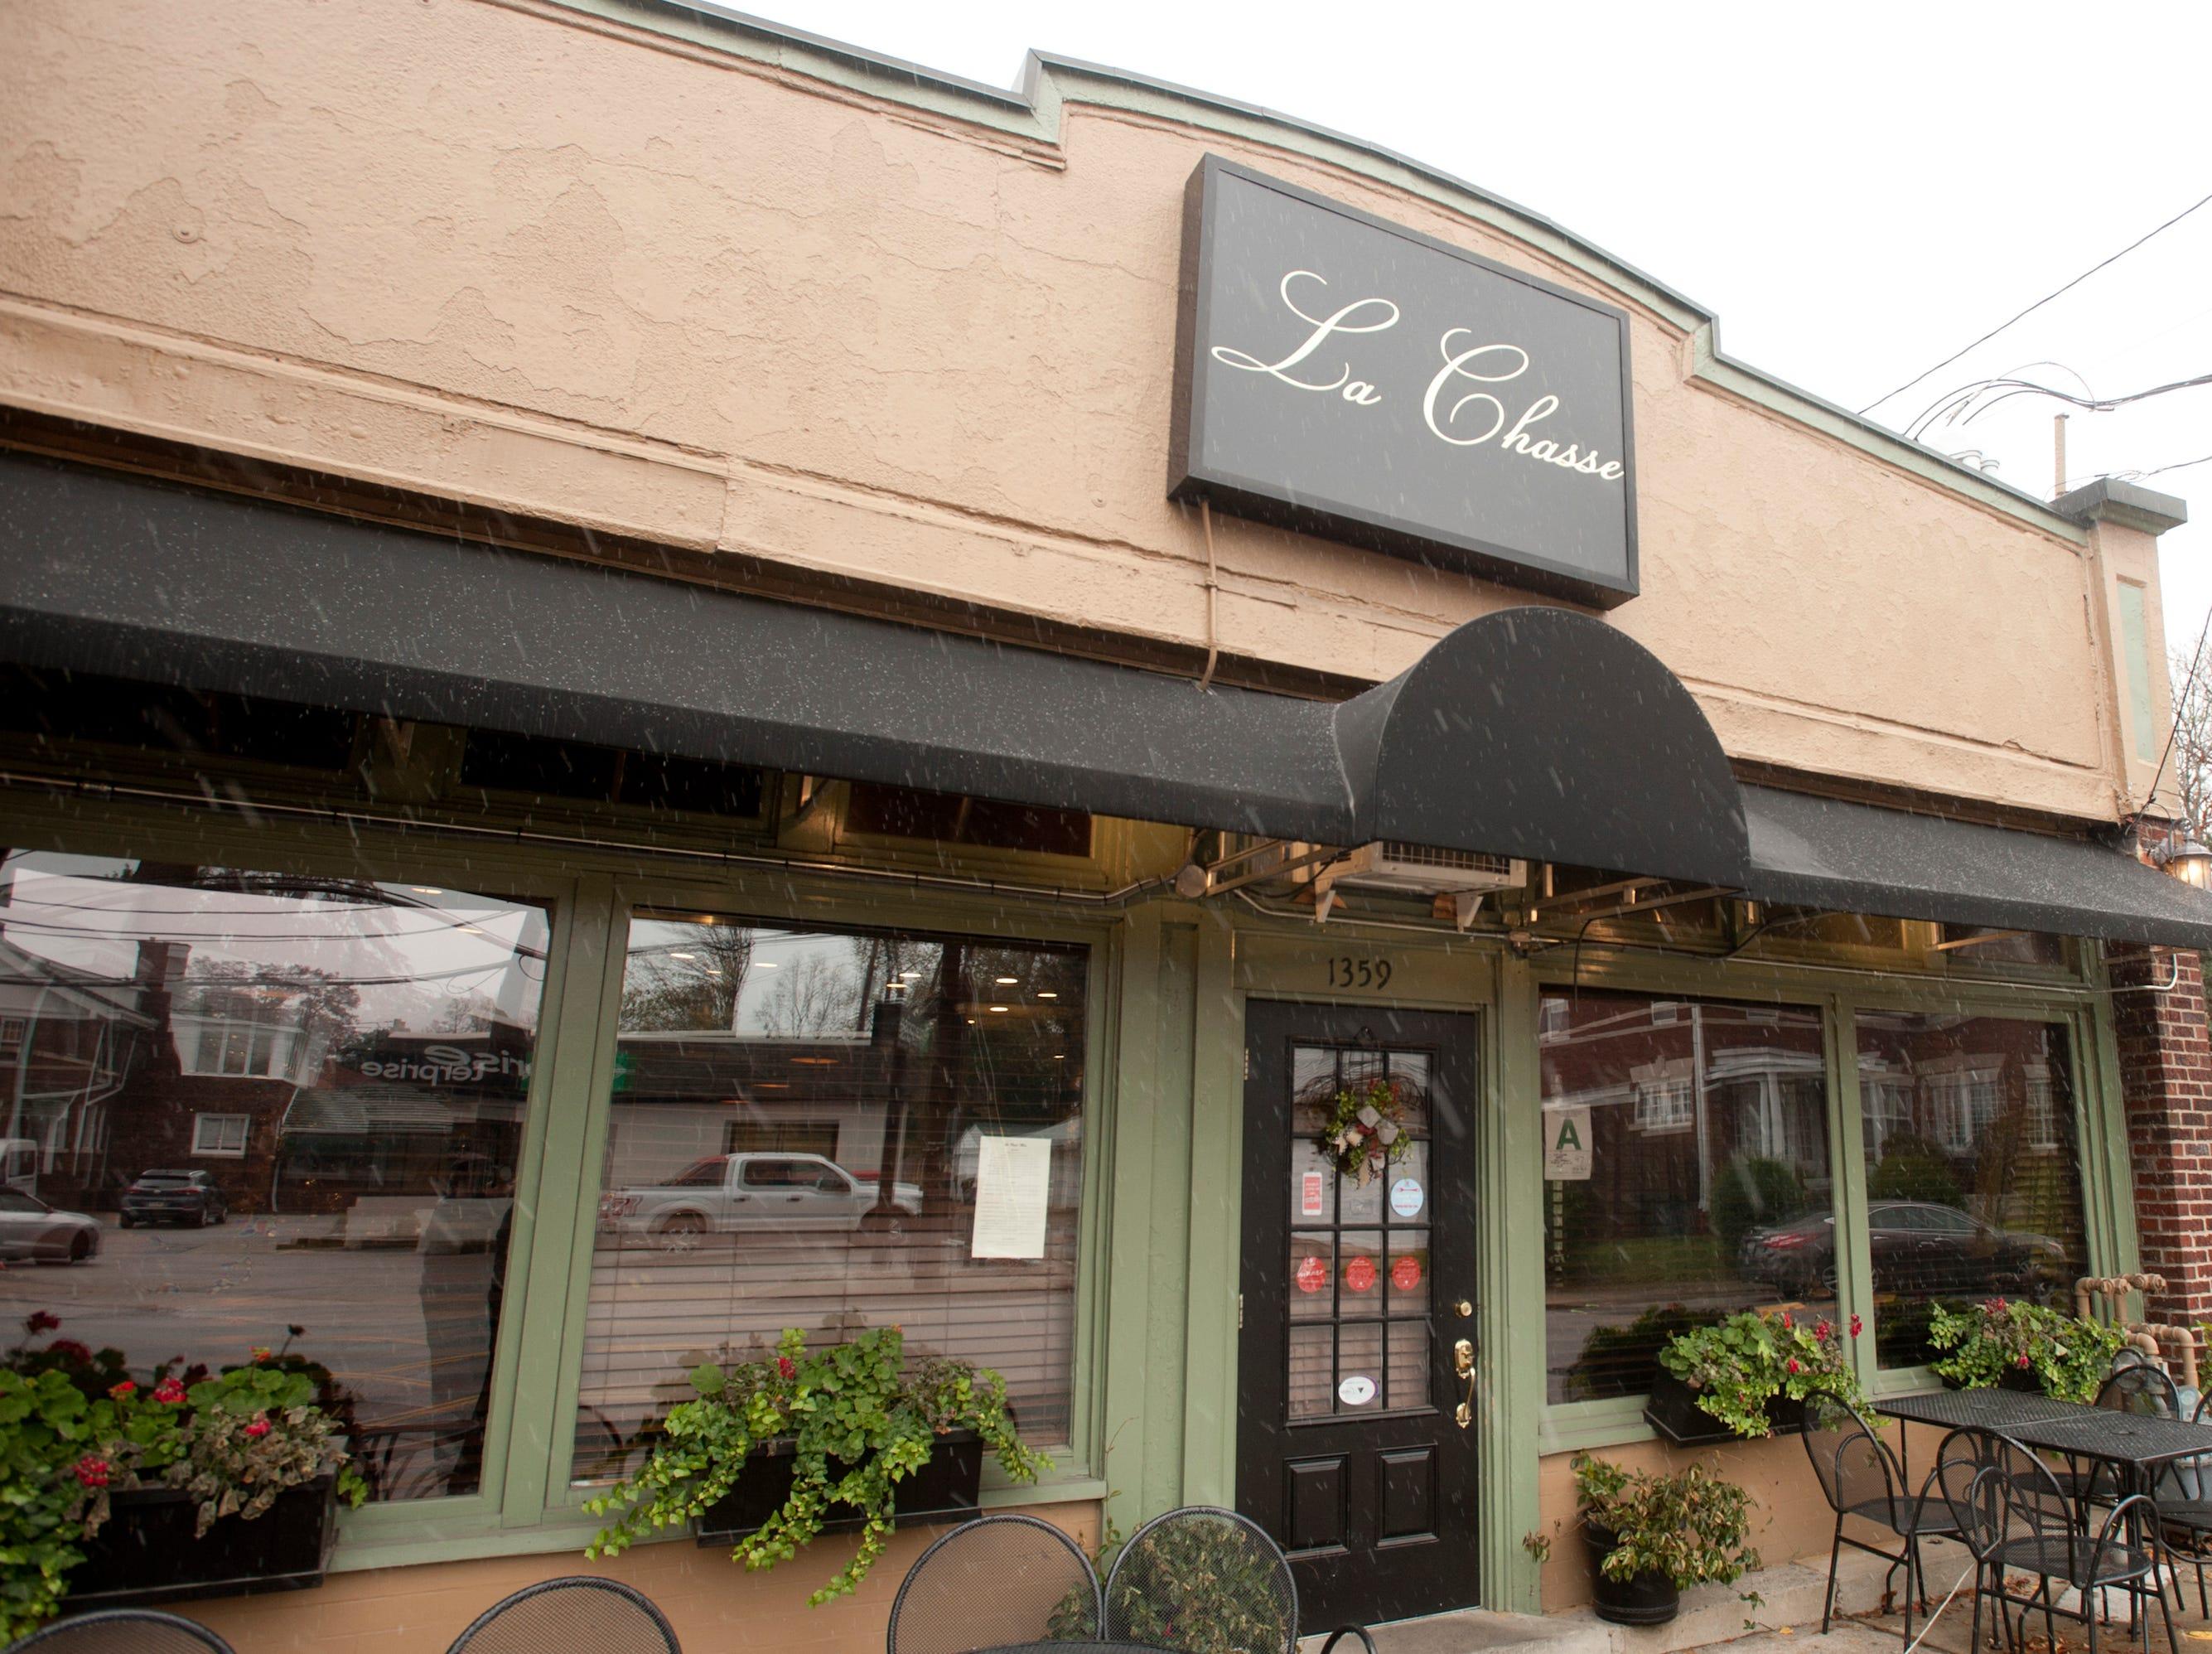 The La Chasse Restaurant on Bardstown Road.November 15, 2018